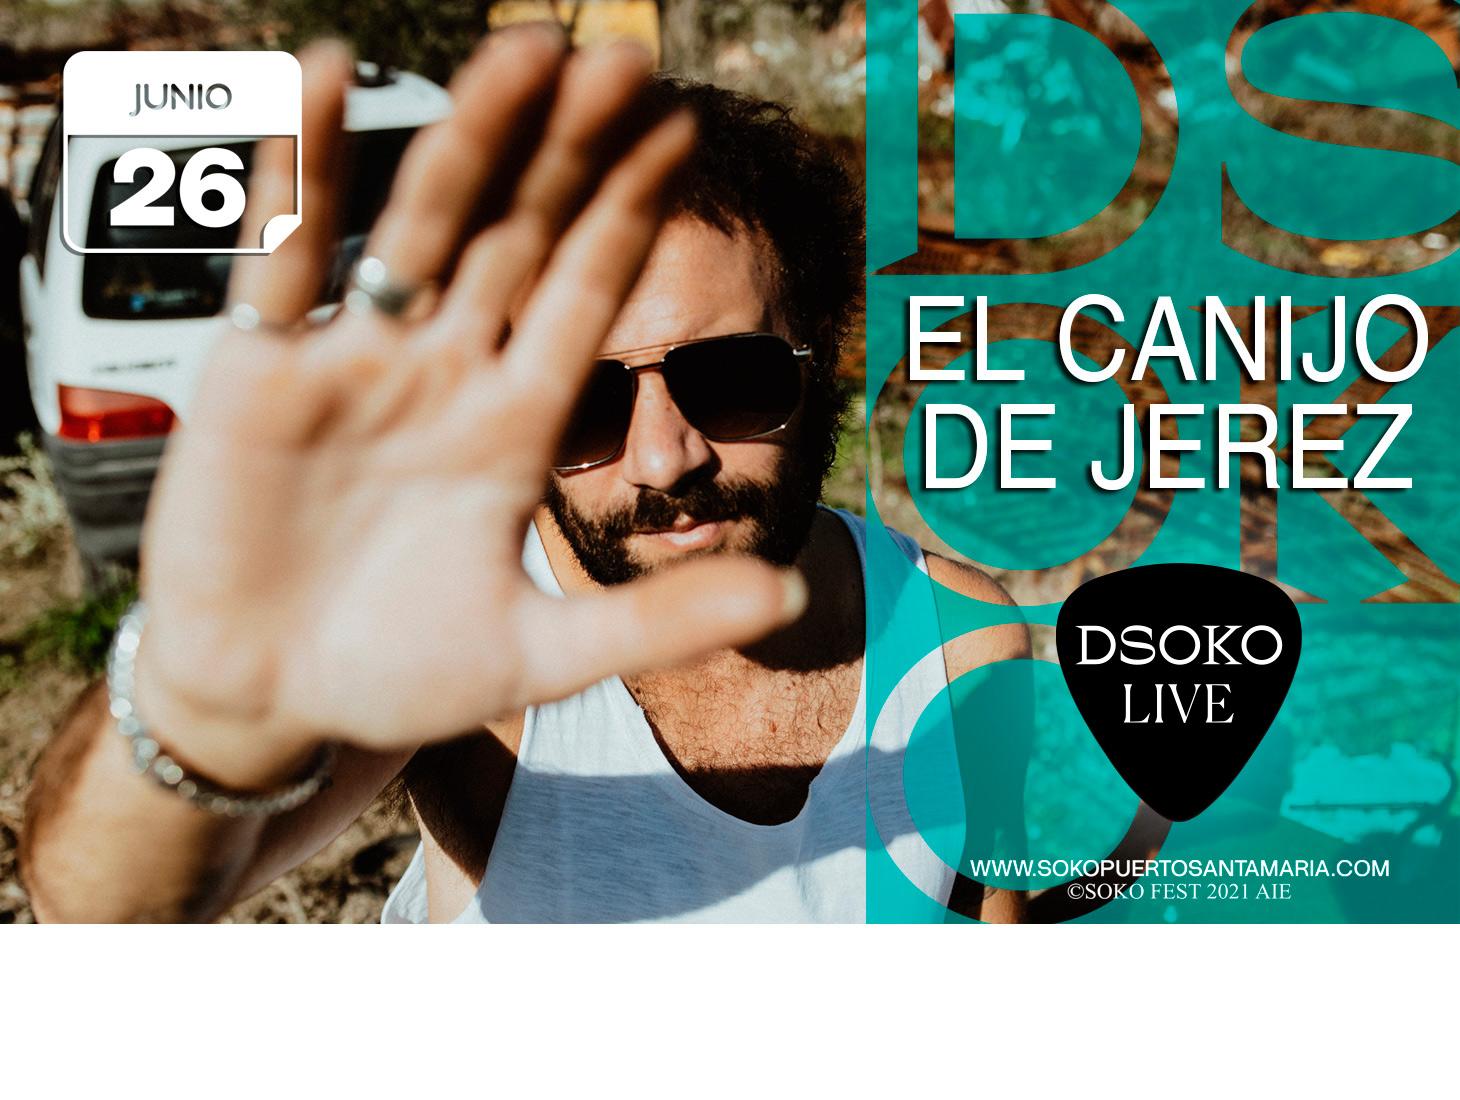 el-canijo-de-jerez-soko-fest-sabado-26-de-junio-60940de680876.jpeg